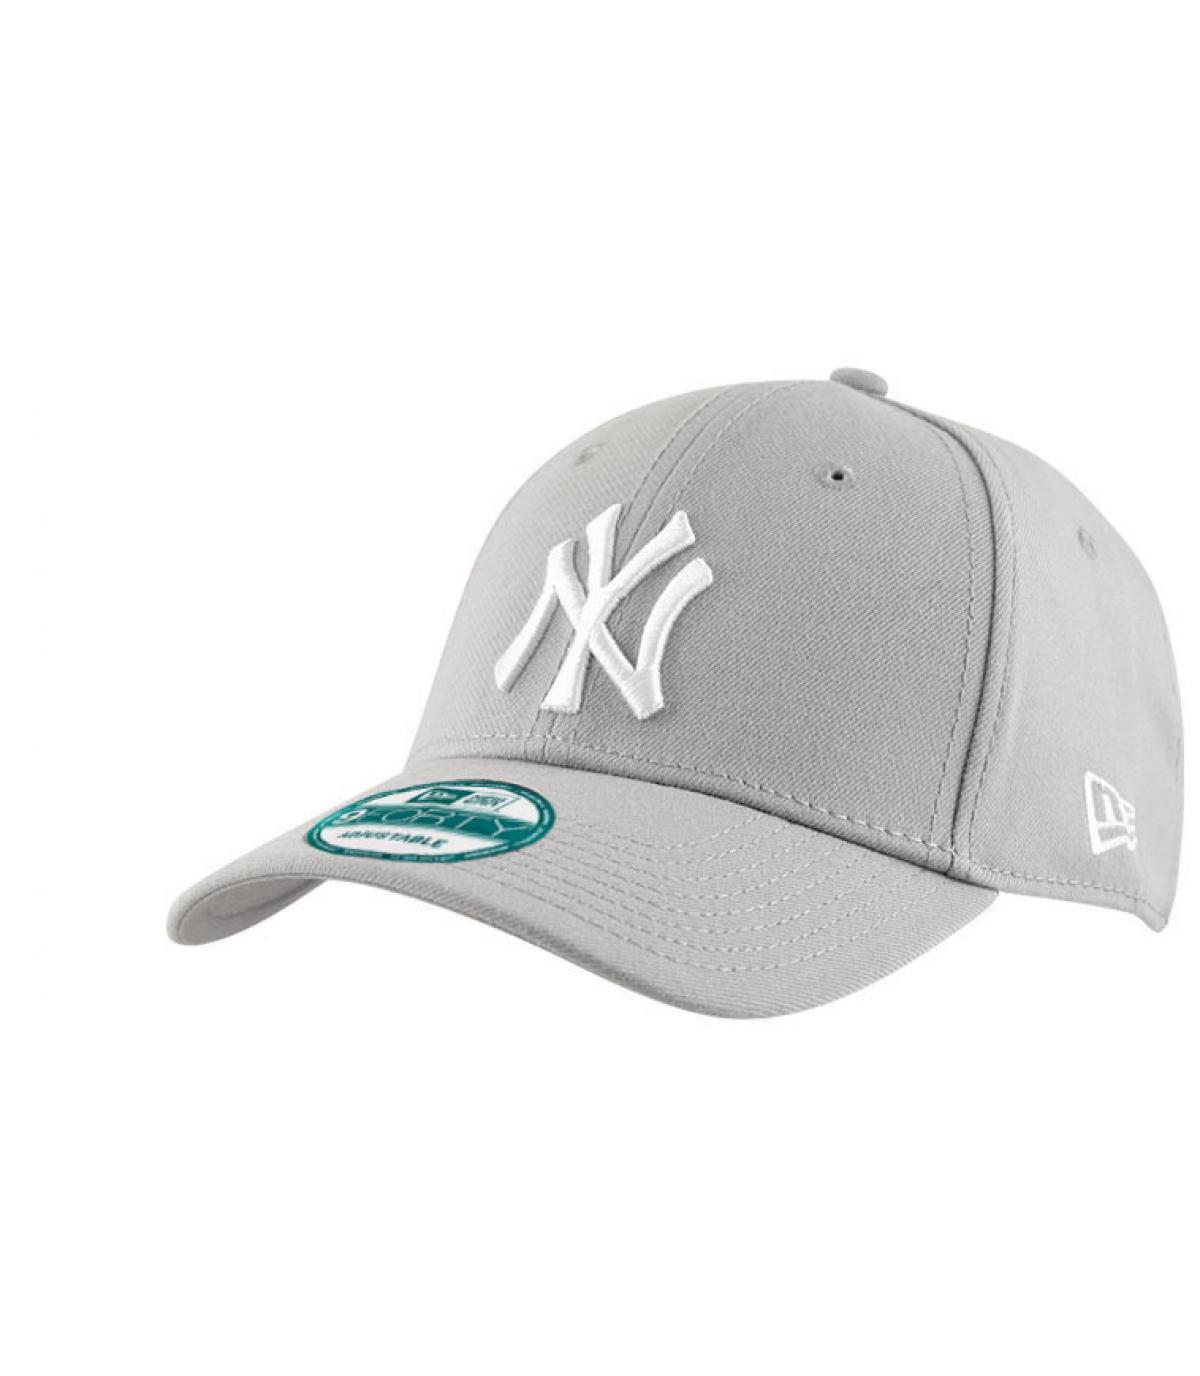 Dettagli League Ess NY 9forty grey white - image 4